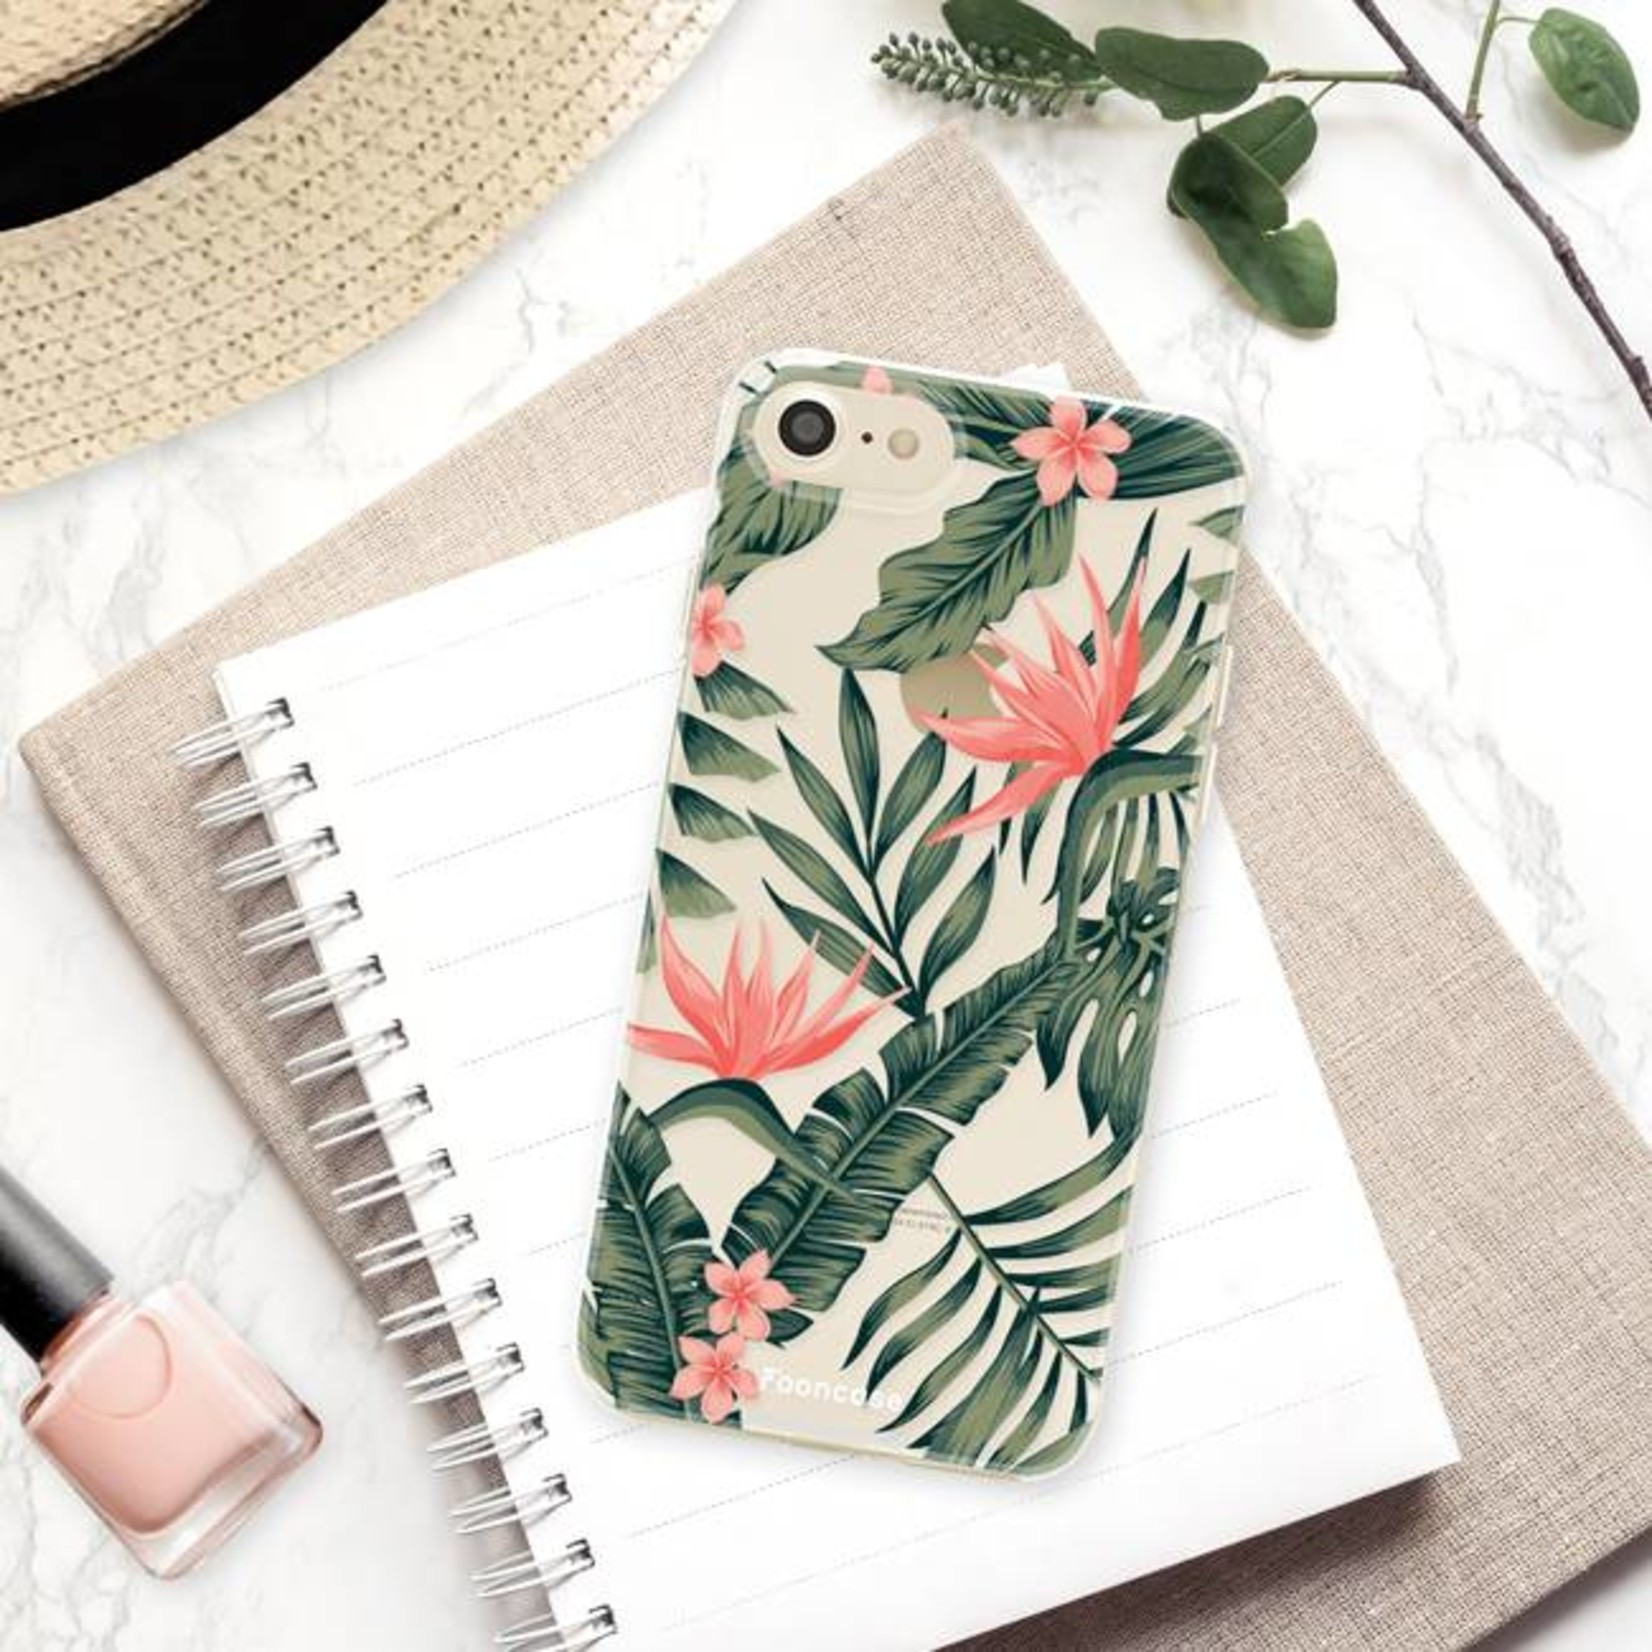 FOONCASE iPhone 8 hoesje TPU Soft Case - Back Cover - Tropical Desire / Bladeren / Roze